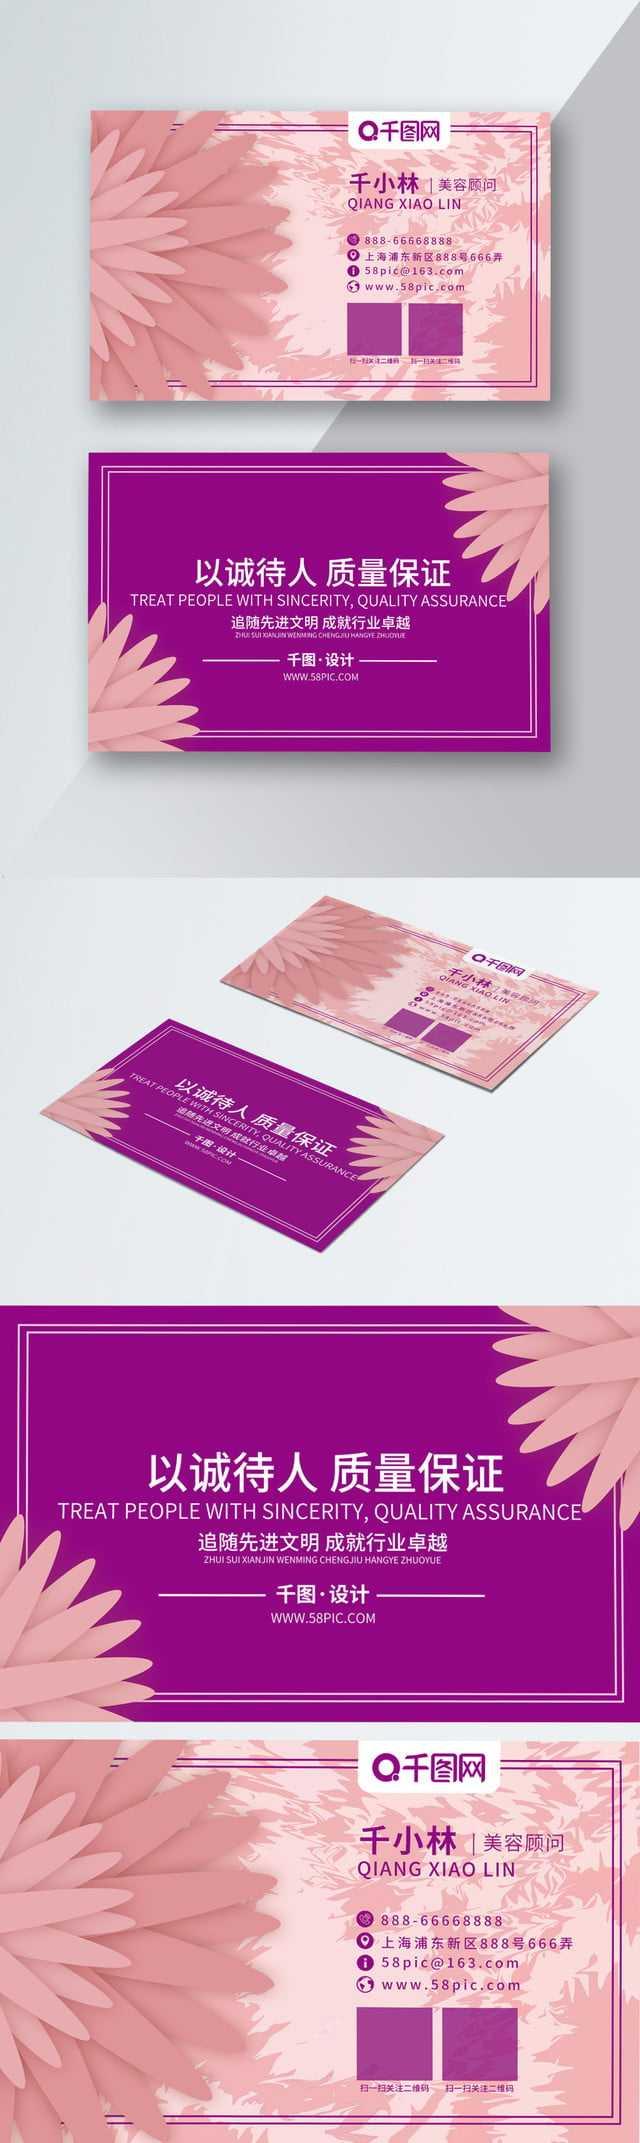 Mary Kay Business Card Mary Kay Business Card Template Mary Within Mary Kay Business Cards Templates Free